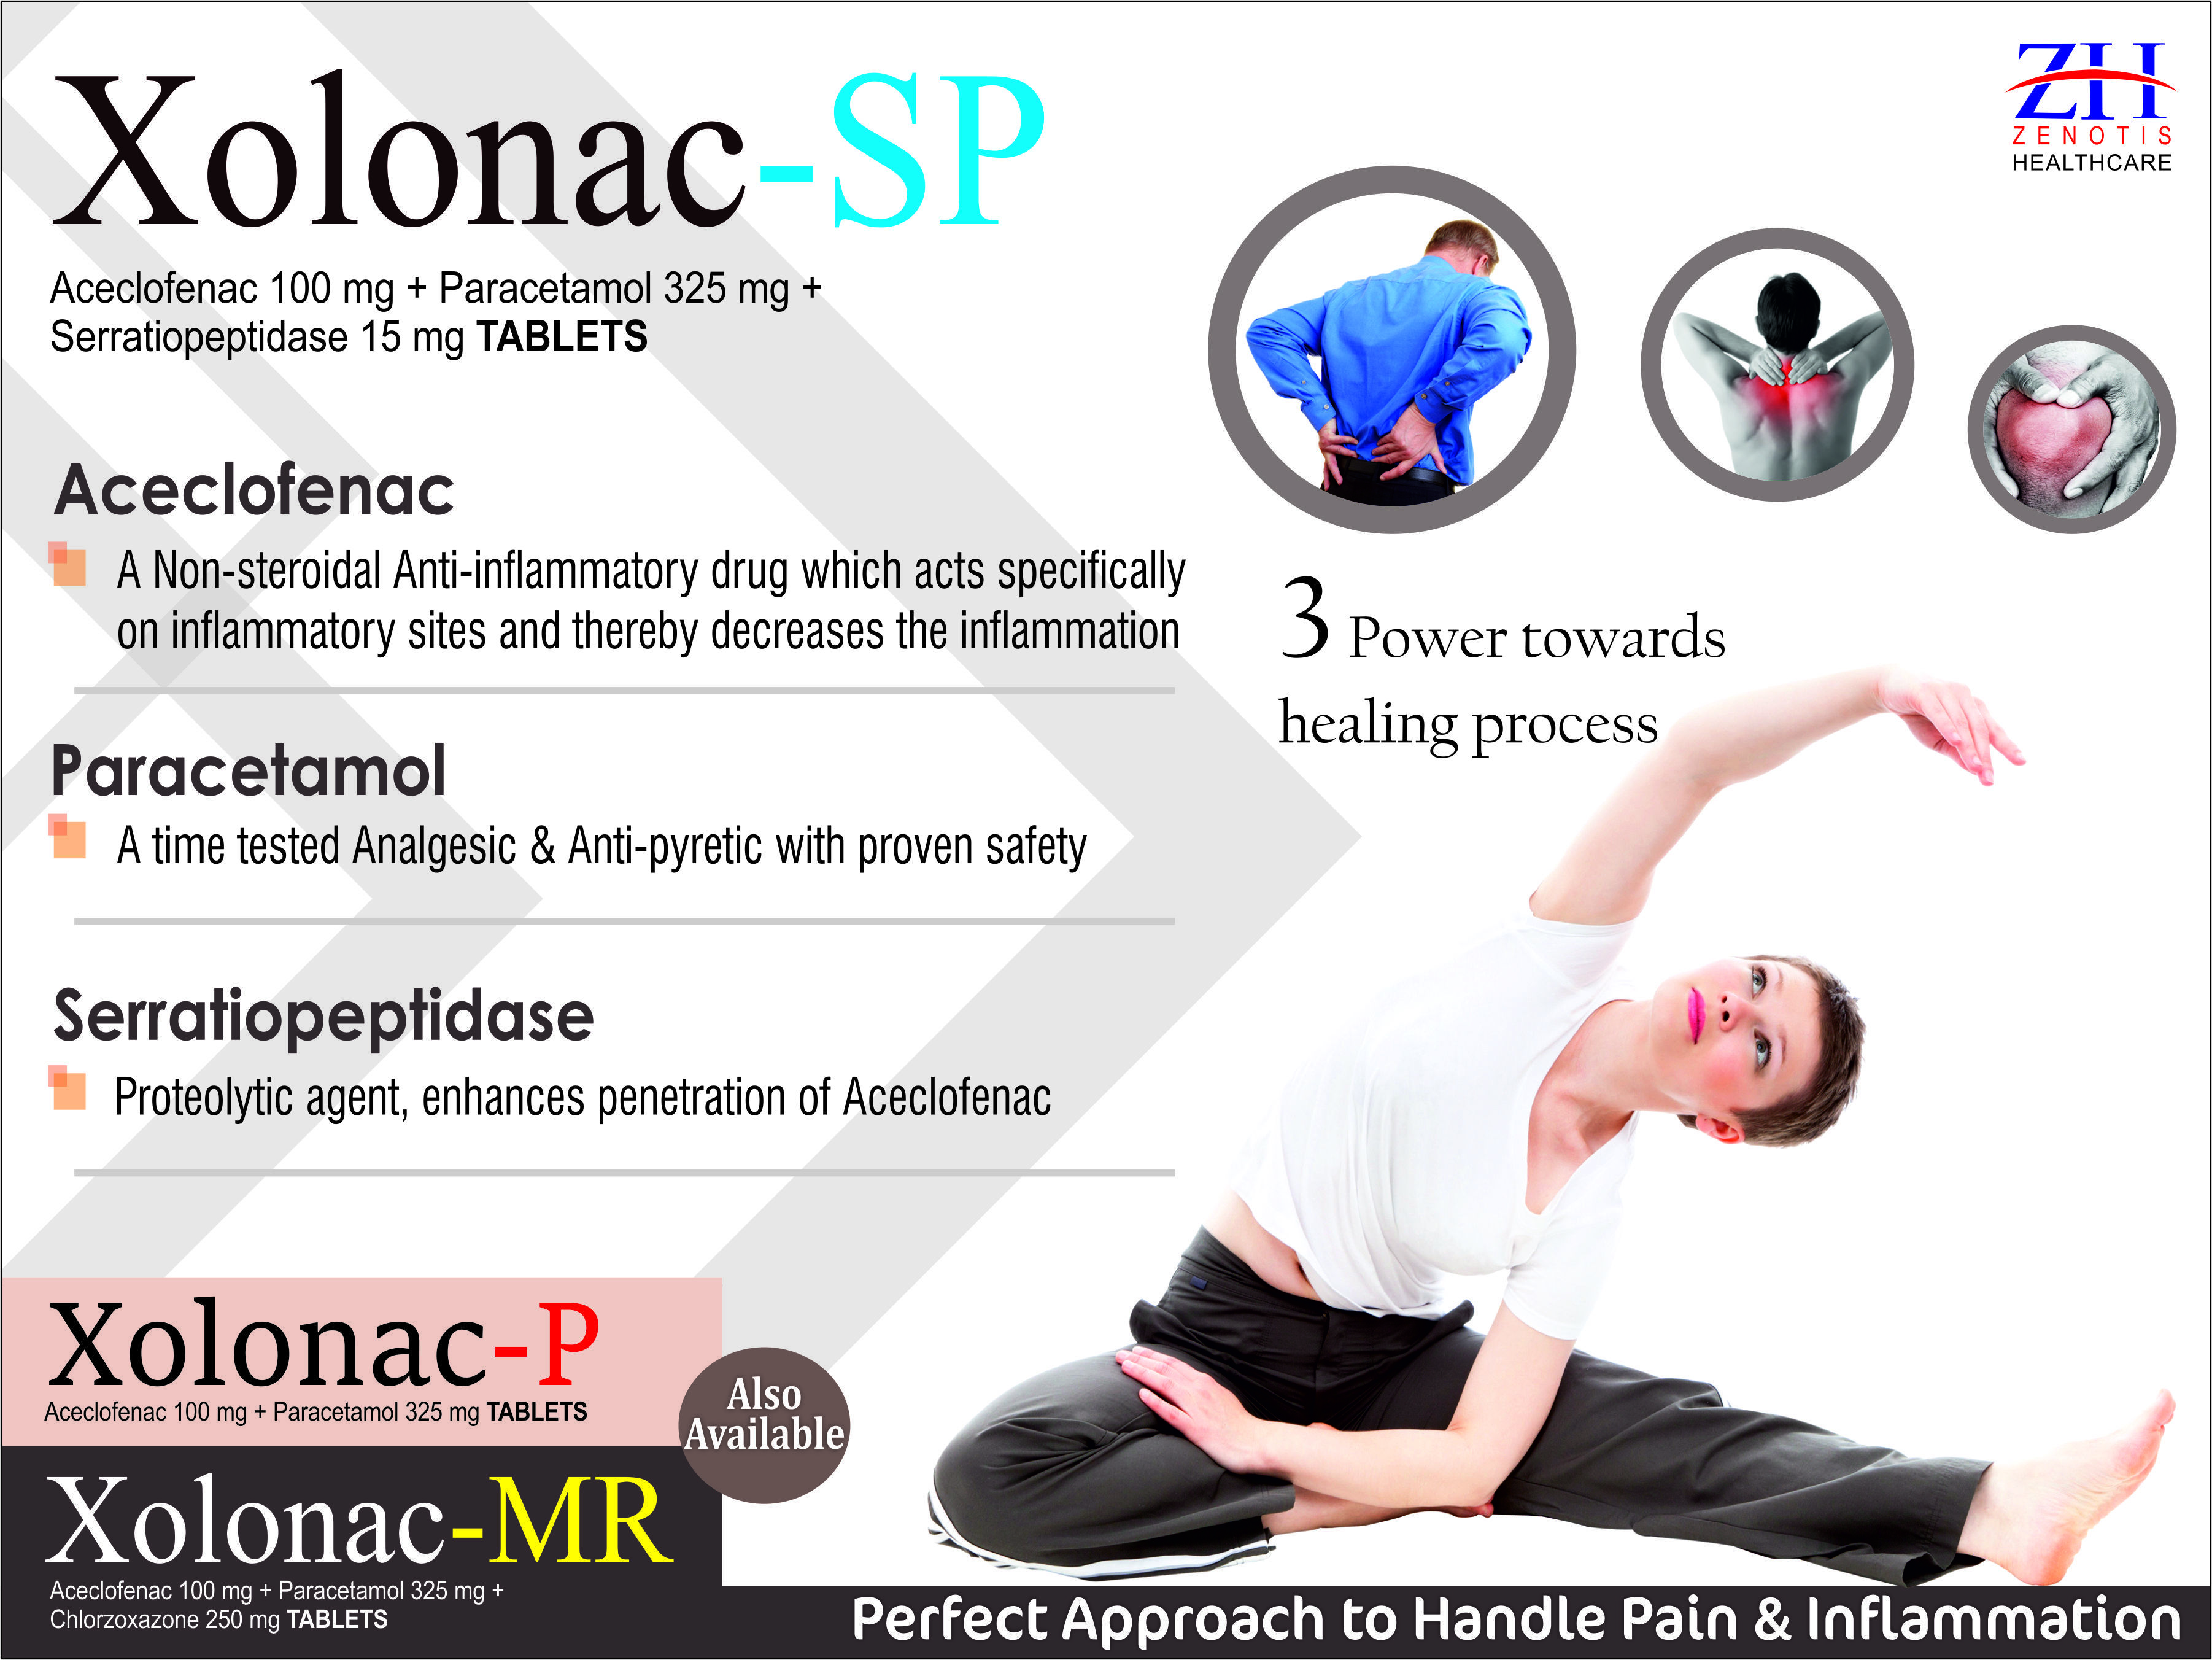 Aceclofenac 100mg & Paracetamol 325mg Tablets